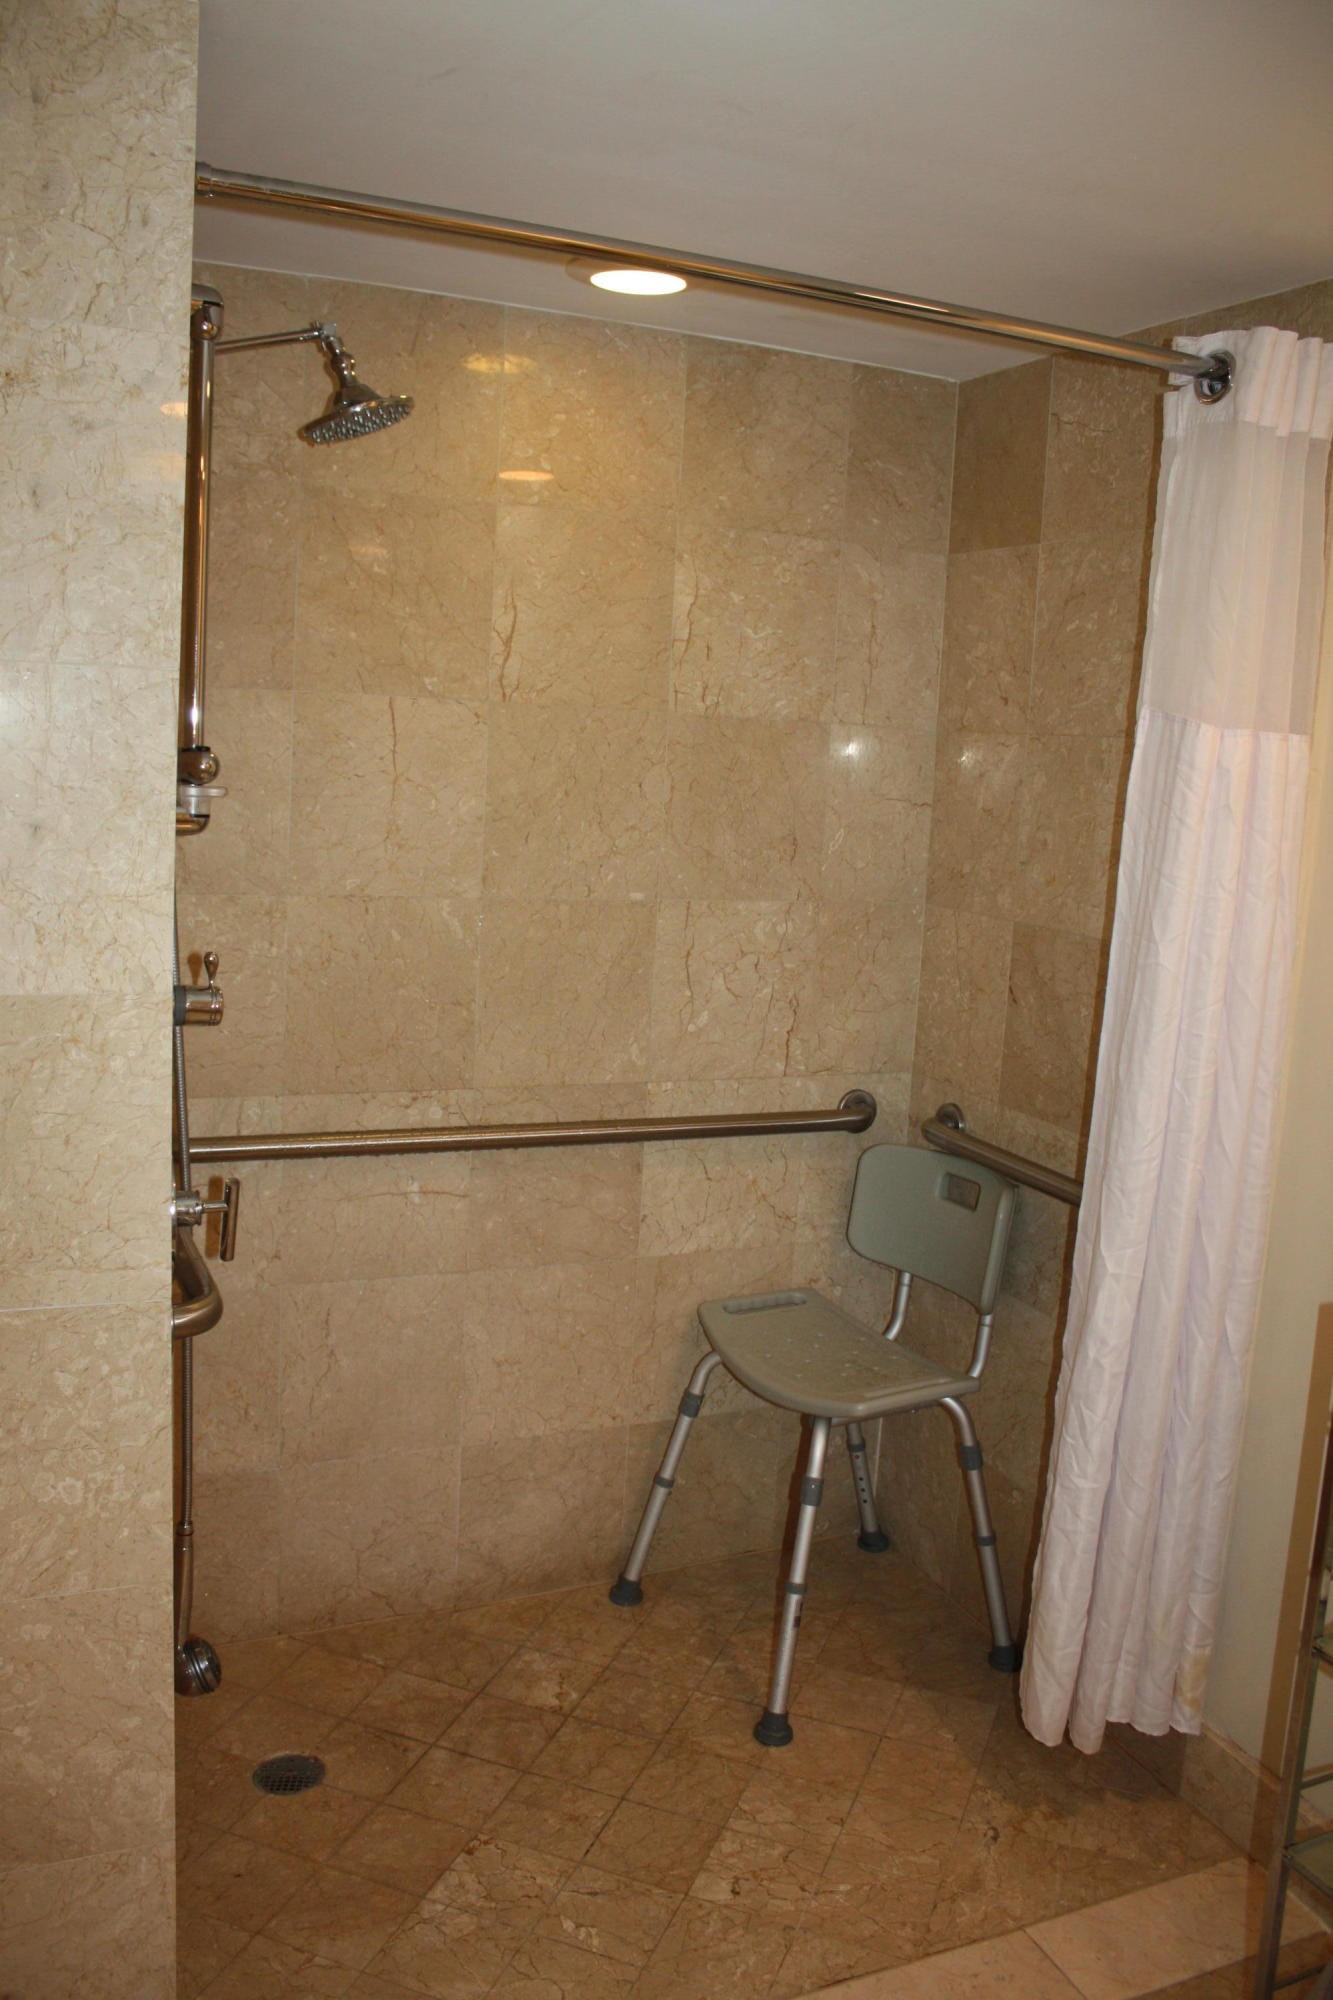 2670 Sunrise Boulevard, Fort Lauderdale, Florida 33304, 1 Bedroom Bedrooms, ,1 BathroomBathrooms,Condo/Coop,For Sale,Sunrise,5,RX-10385804